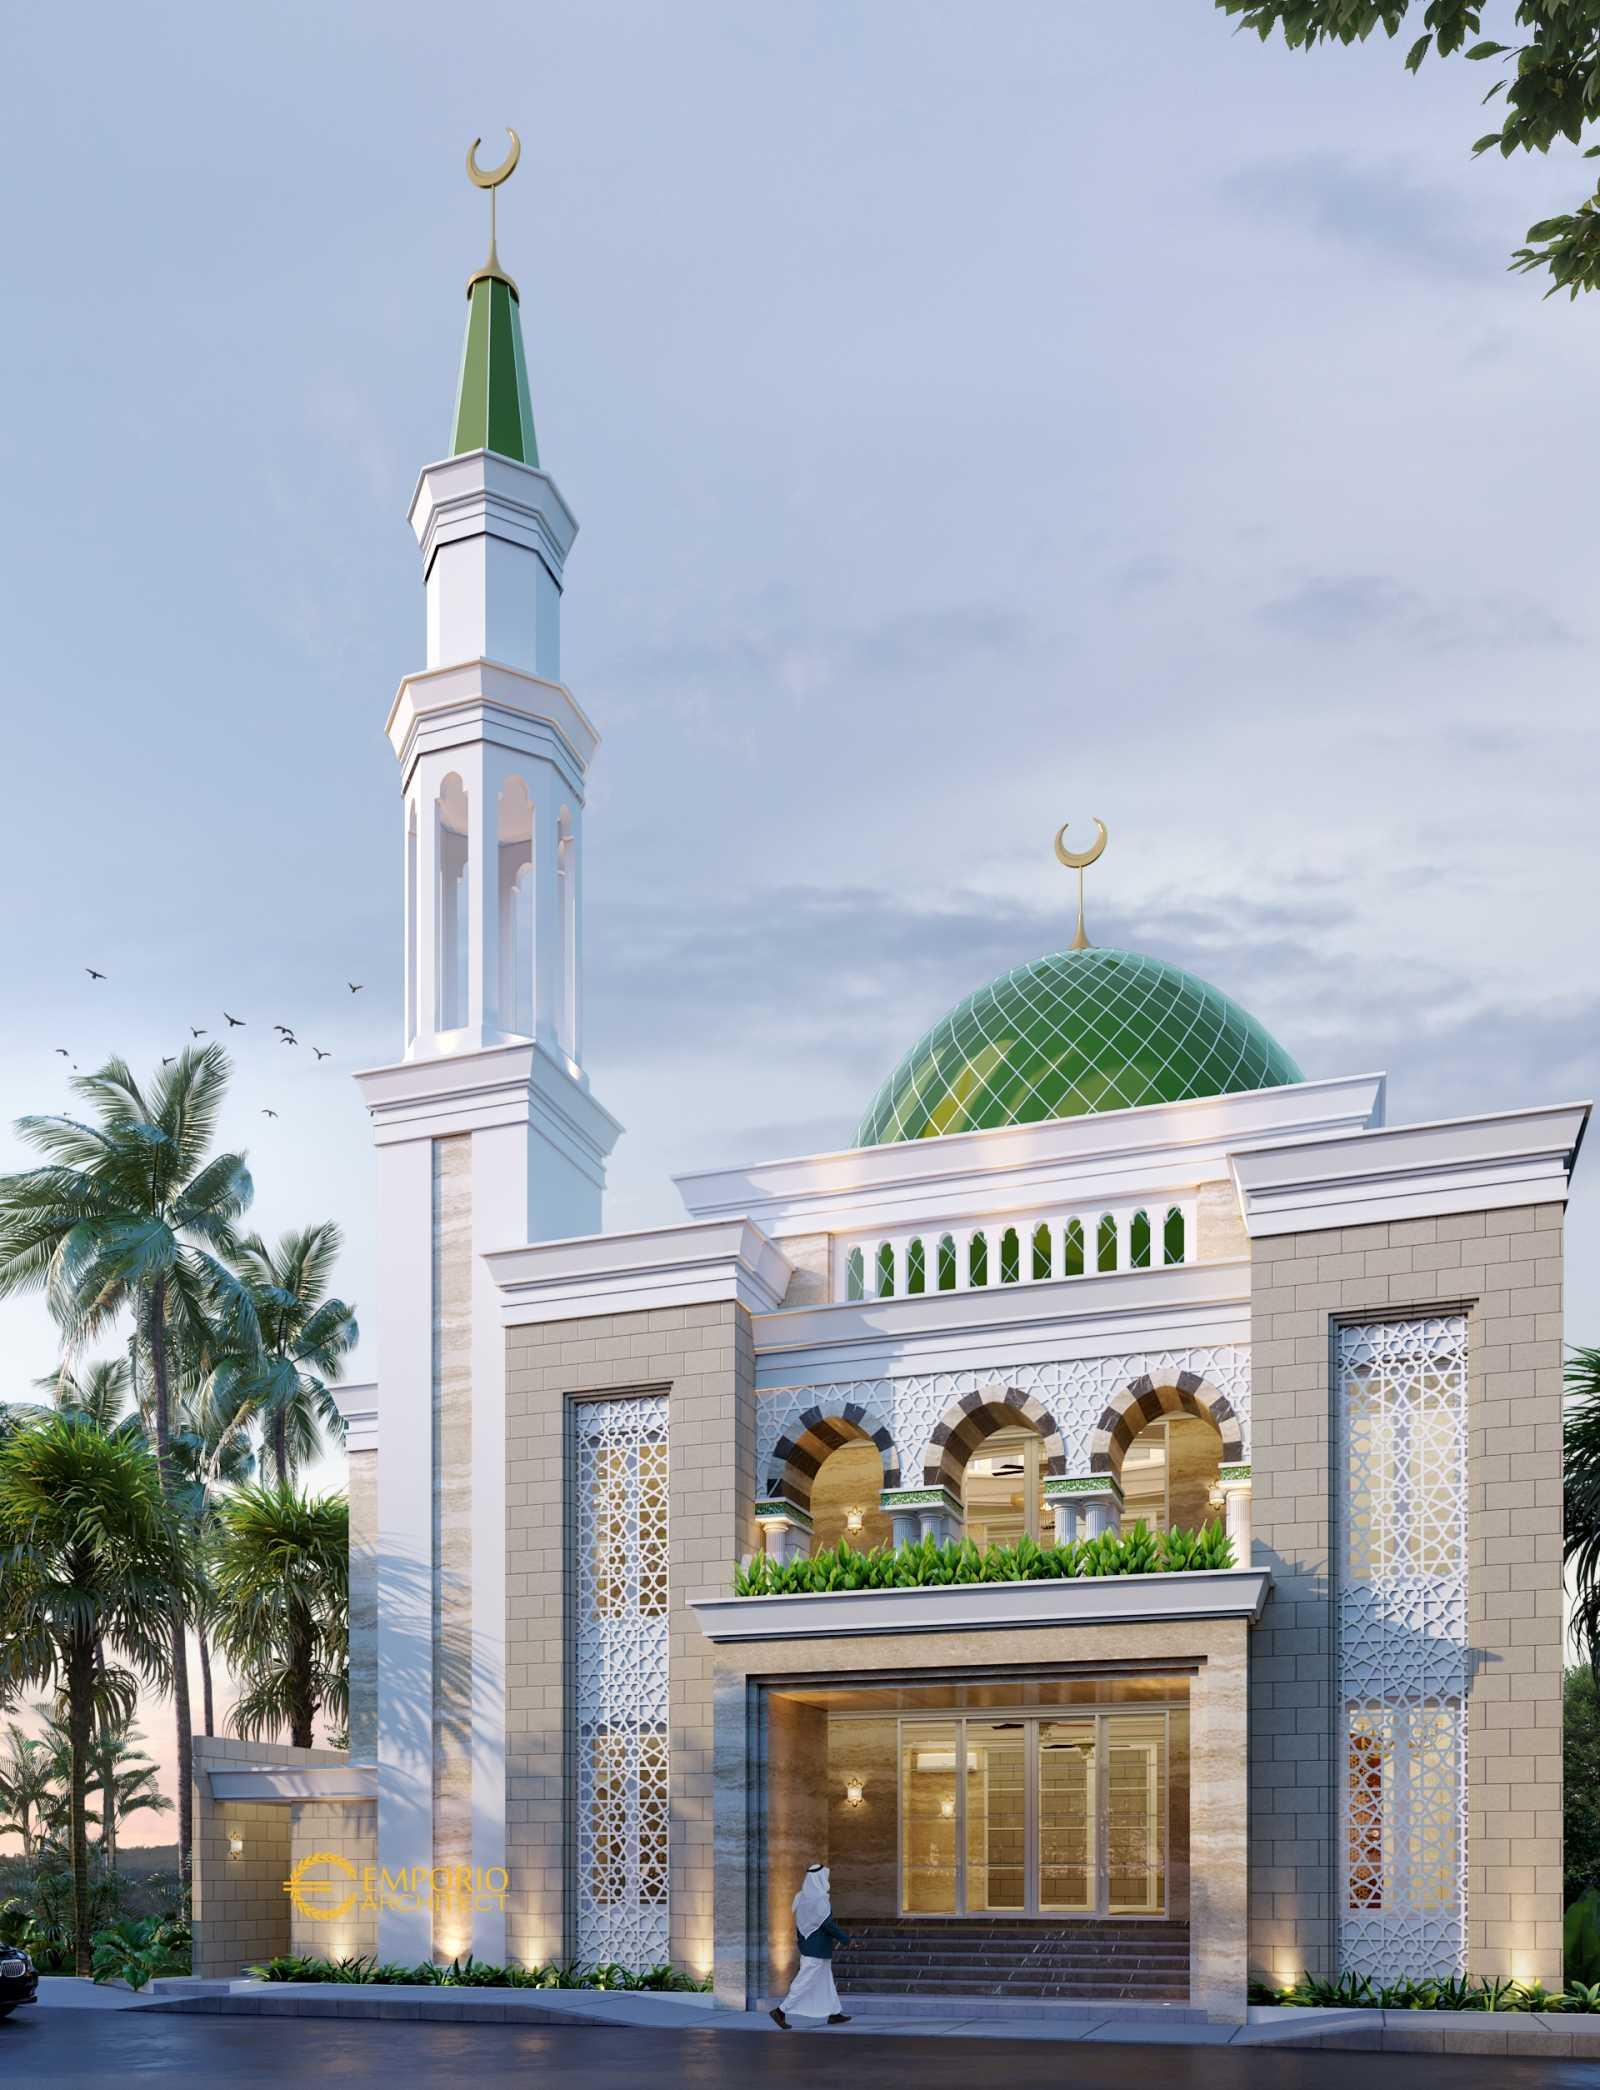 Emporio Architect Desain Masjid 607 @ Cikarang, Bekasi Cikarang, Bekasi, Jawa Barat, Indonesia Cikarang, Bekasi, Jawa Barat, Indonesia Emporio-Architect-Desain-Masjid-607-Cikarang-Bekasi Classic 77438